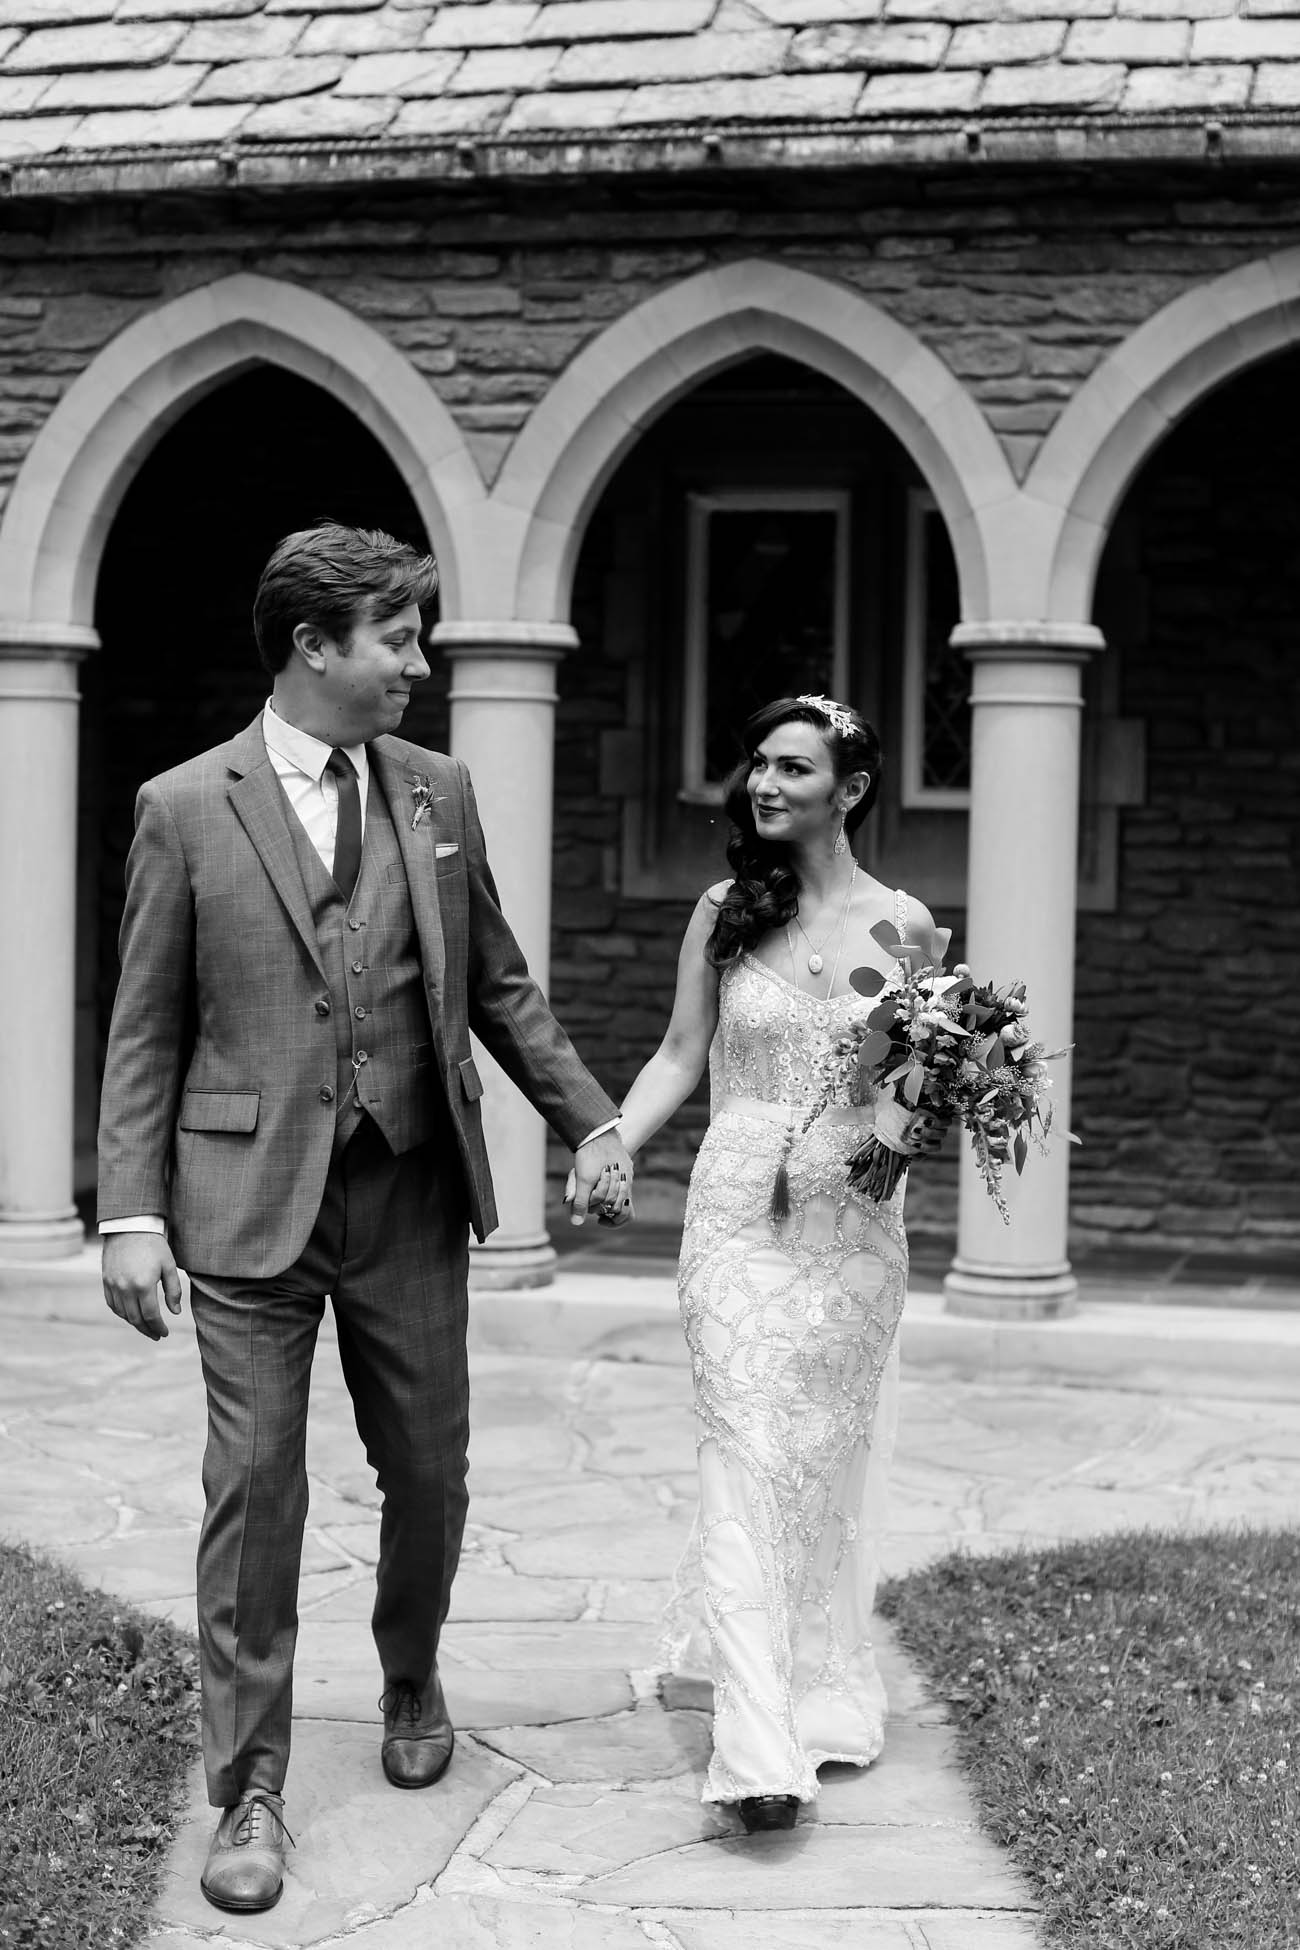 Speakeasy-1920s-theme-Louisville-and-Lexington Wedding-66.jpg